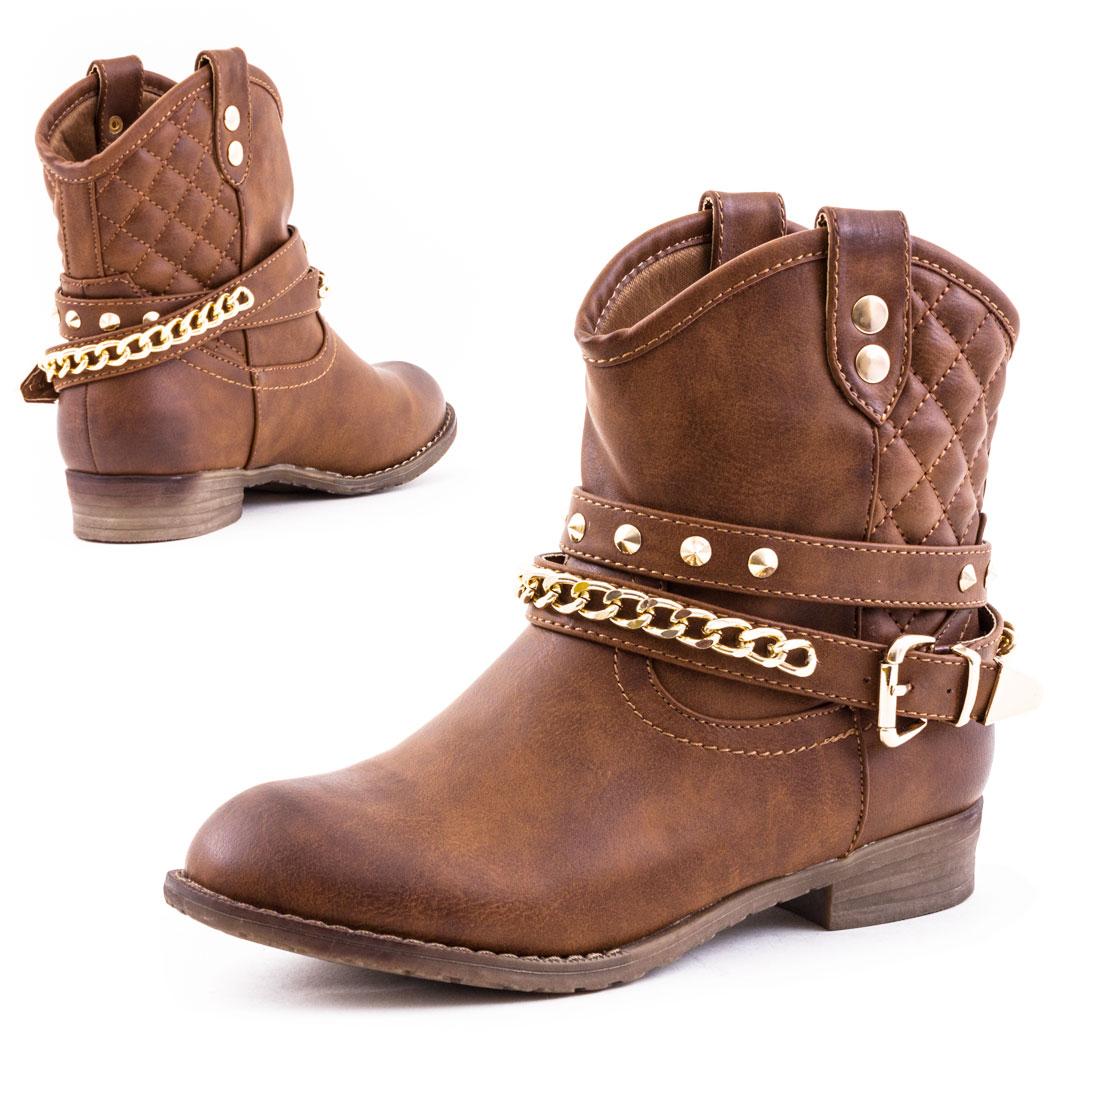 neu damen western cowboy stiefel nieten boots schuhe gr 36. Black Bedroom Furniture Sets. Home Design Ideas